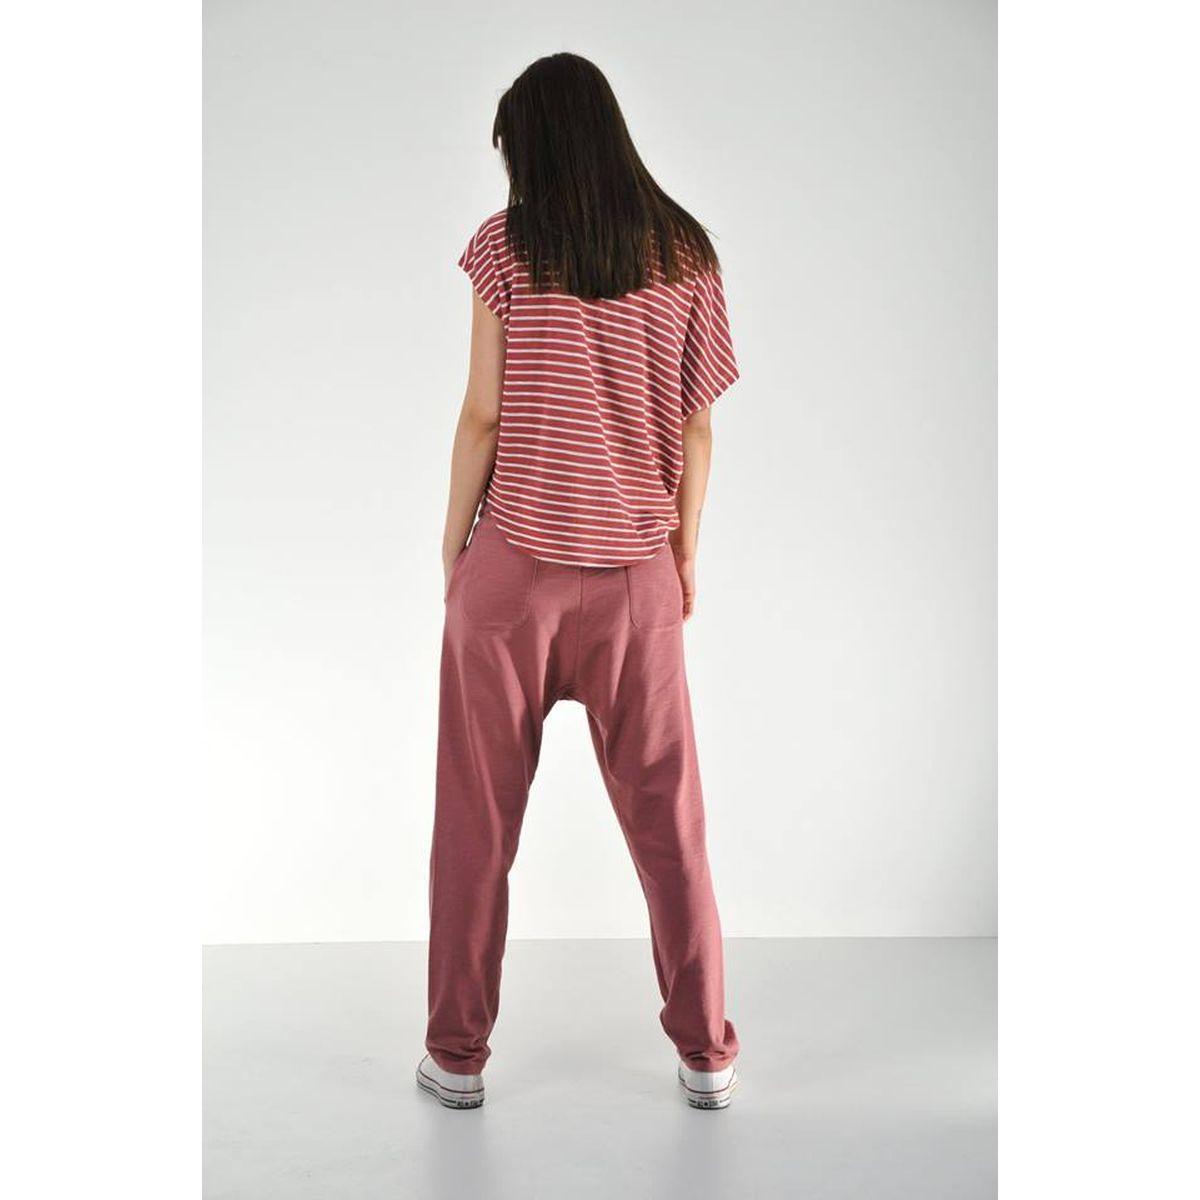 7c270d54537a Καλοκαιρινά μπλουζάκια γυναικεία - e-royxa.gr